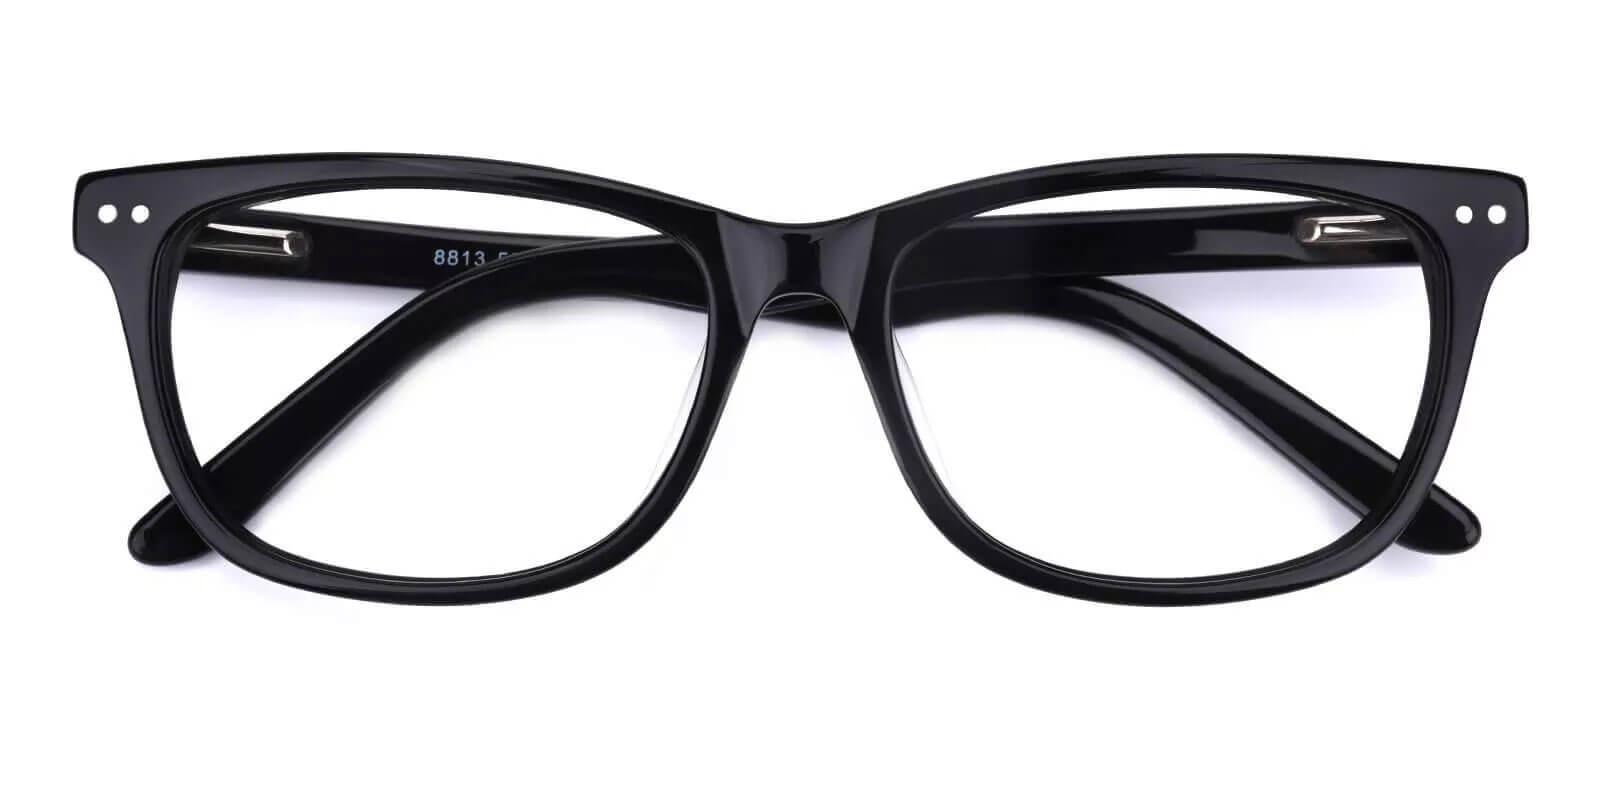 Alta Black Acetate Eyeglasses , SpringHinges , UniversalBridgeFit Frames from ABBE Glasses